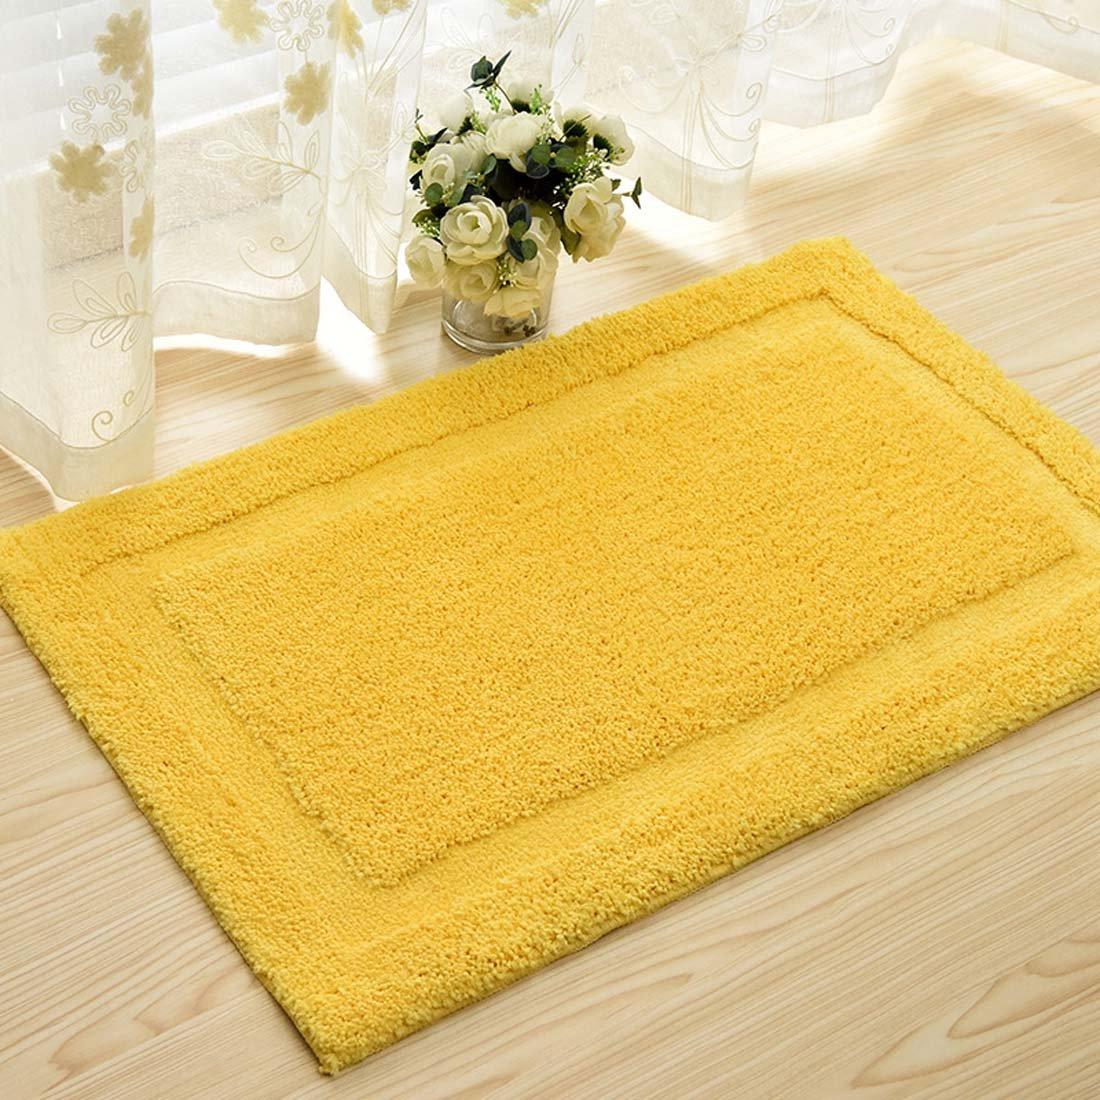 DaringOne Microfiber Polyester Non-Slip Rectangular Spa Mat, Plush Water Absorbent Accent Rug for Bathroom Vanity, Bathtub/Shower, Machine Washable Yellow 17''x25''